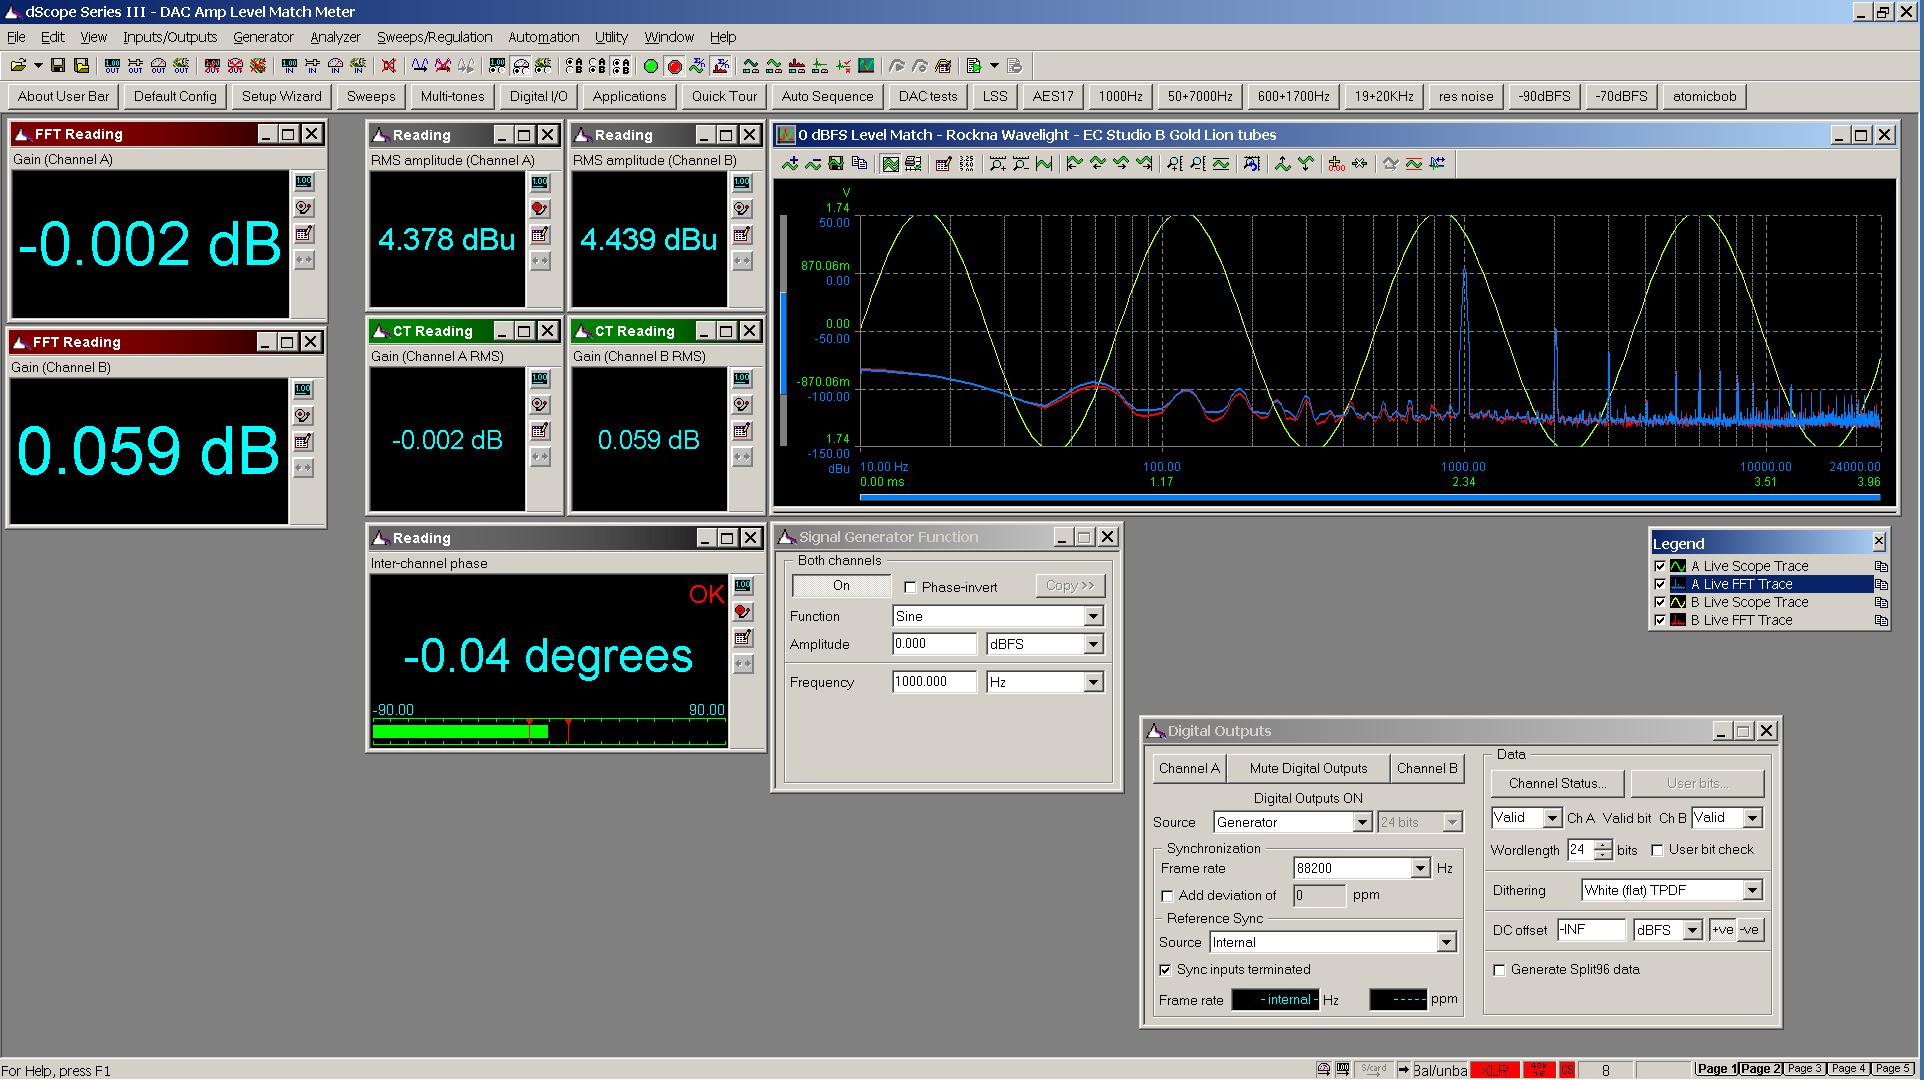 20210513 0dBFS level match EC Studio B - Rockna Wavelight.png